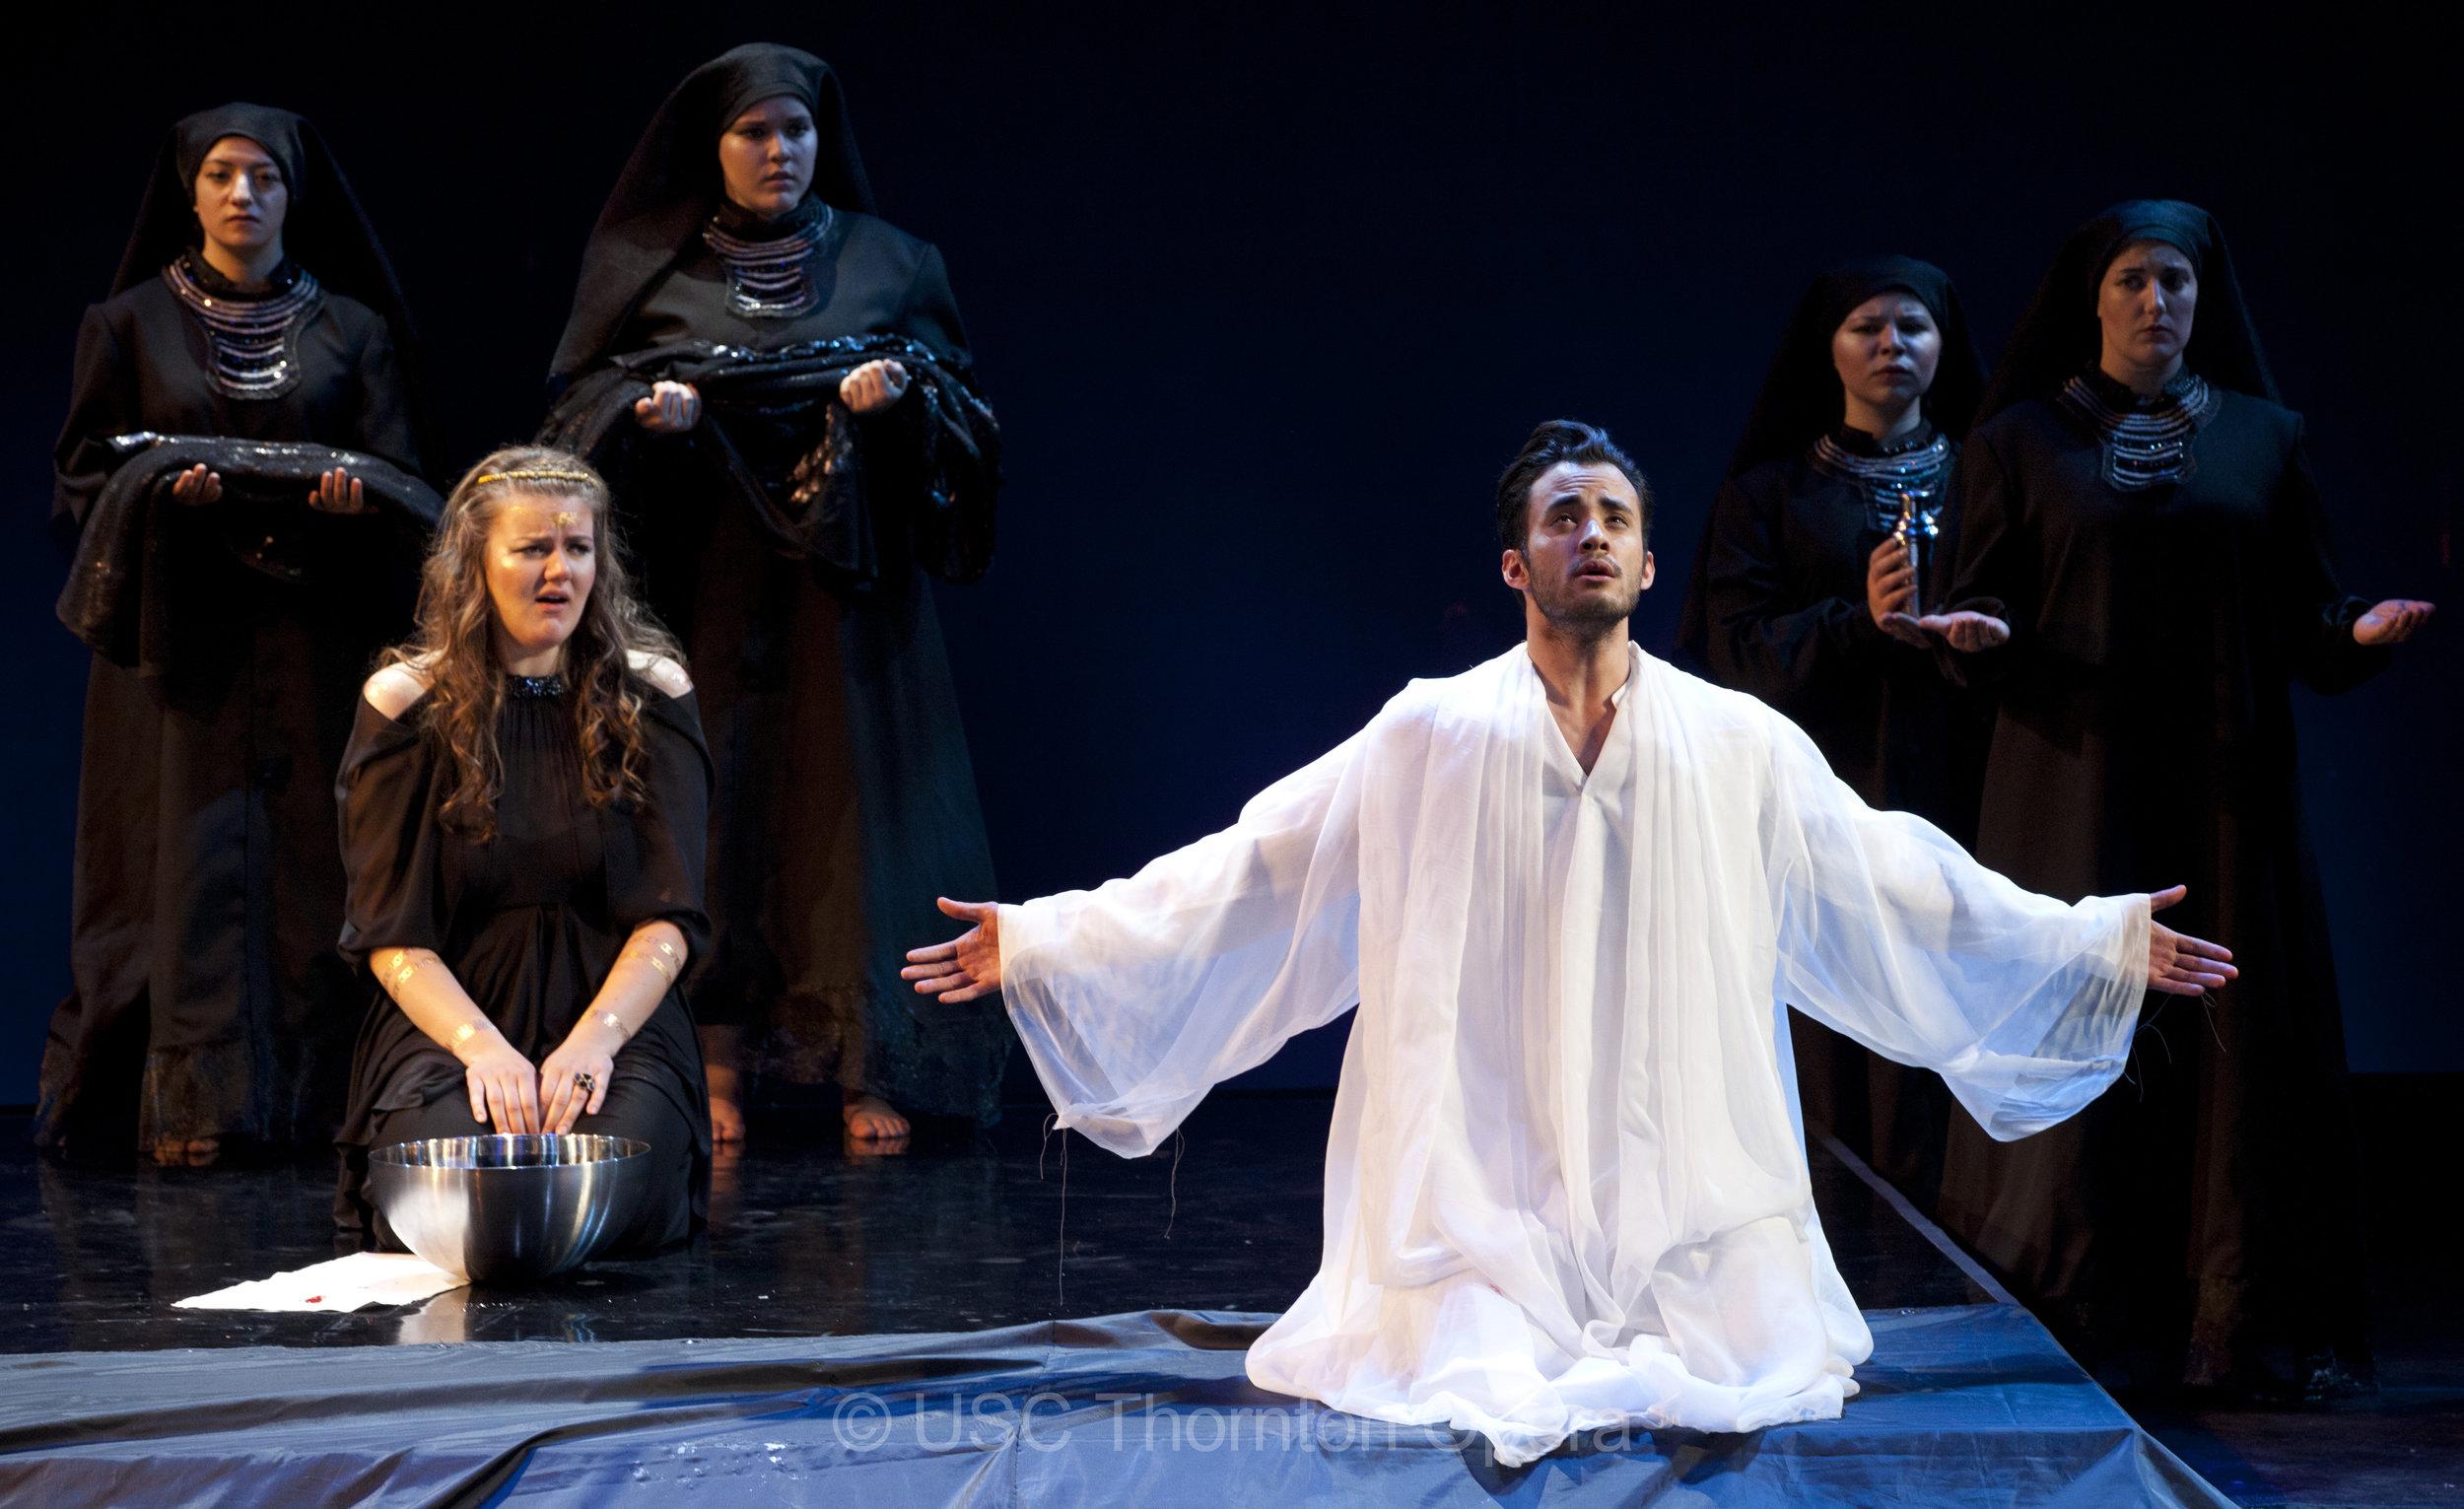 oreste in gluck's  iphigénie en tauride.  yelena dyachek as the title role.  photo credit: kristina jacinth